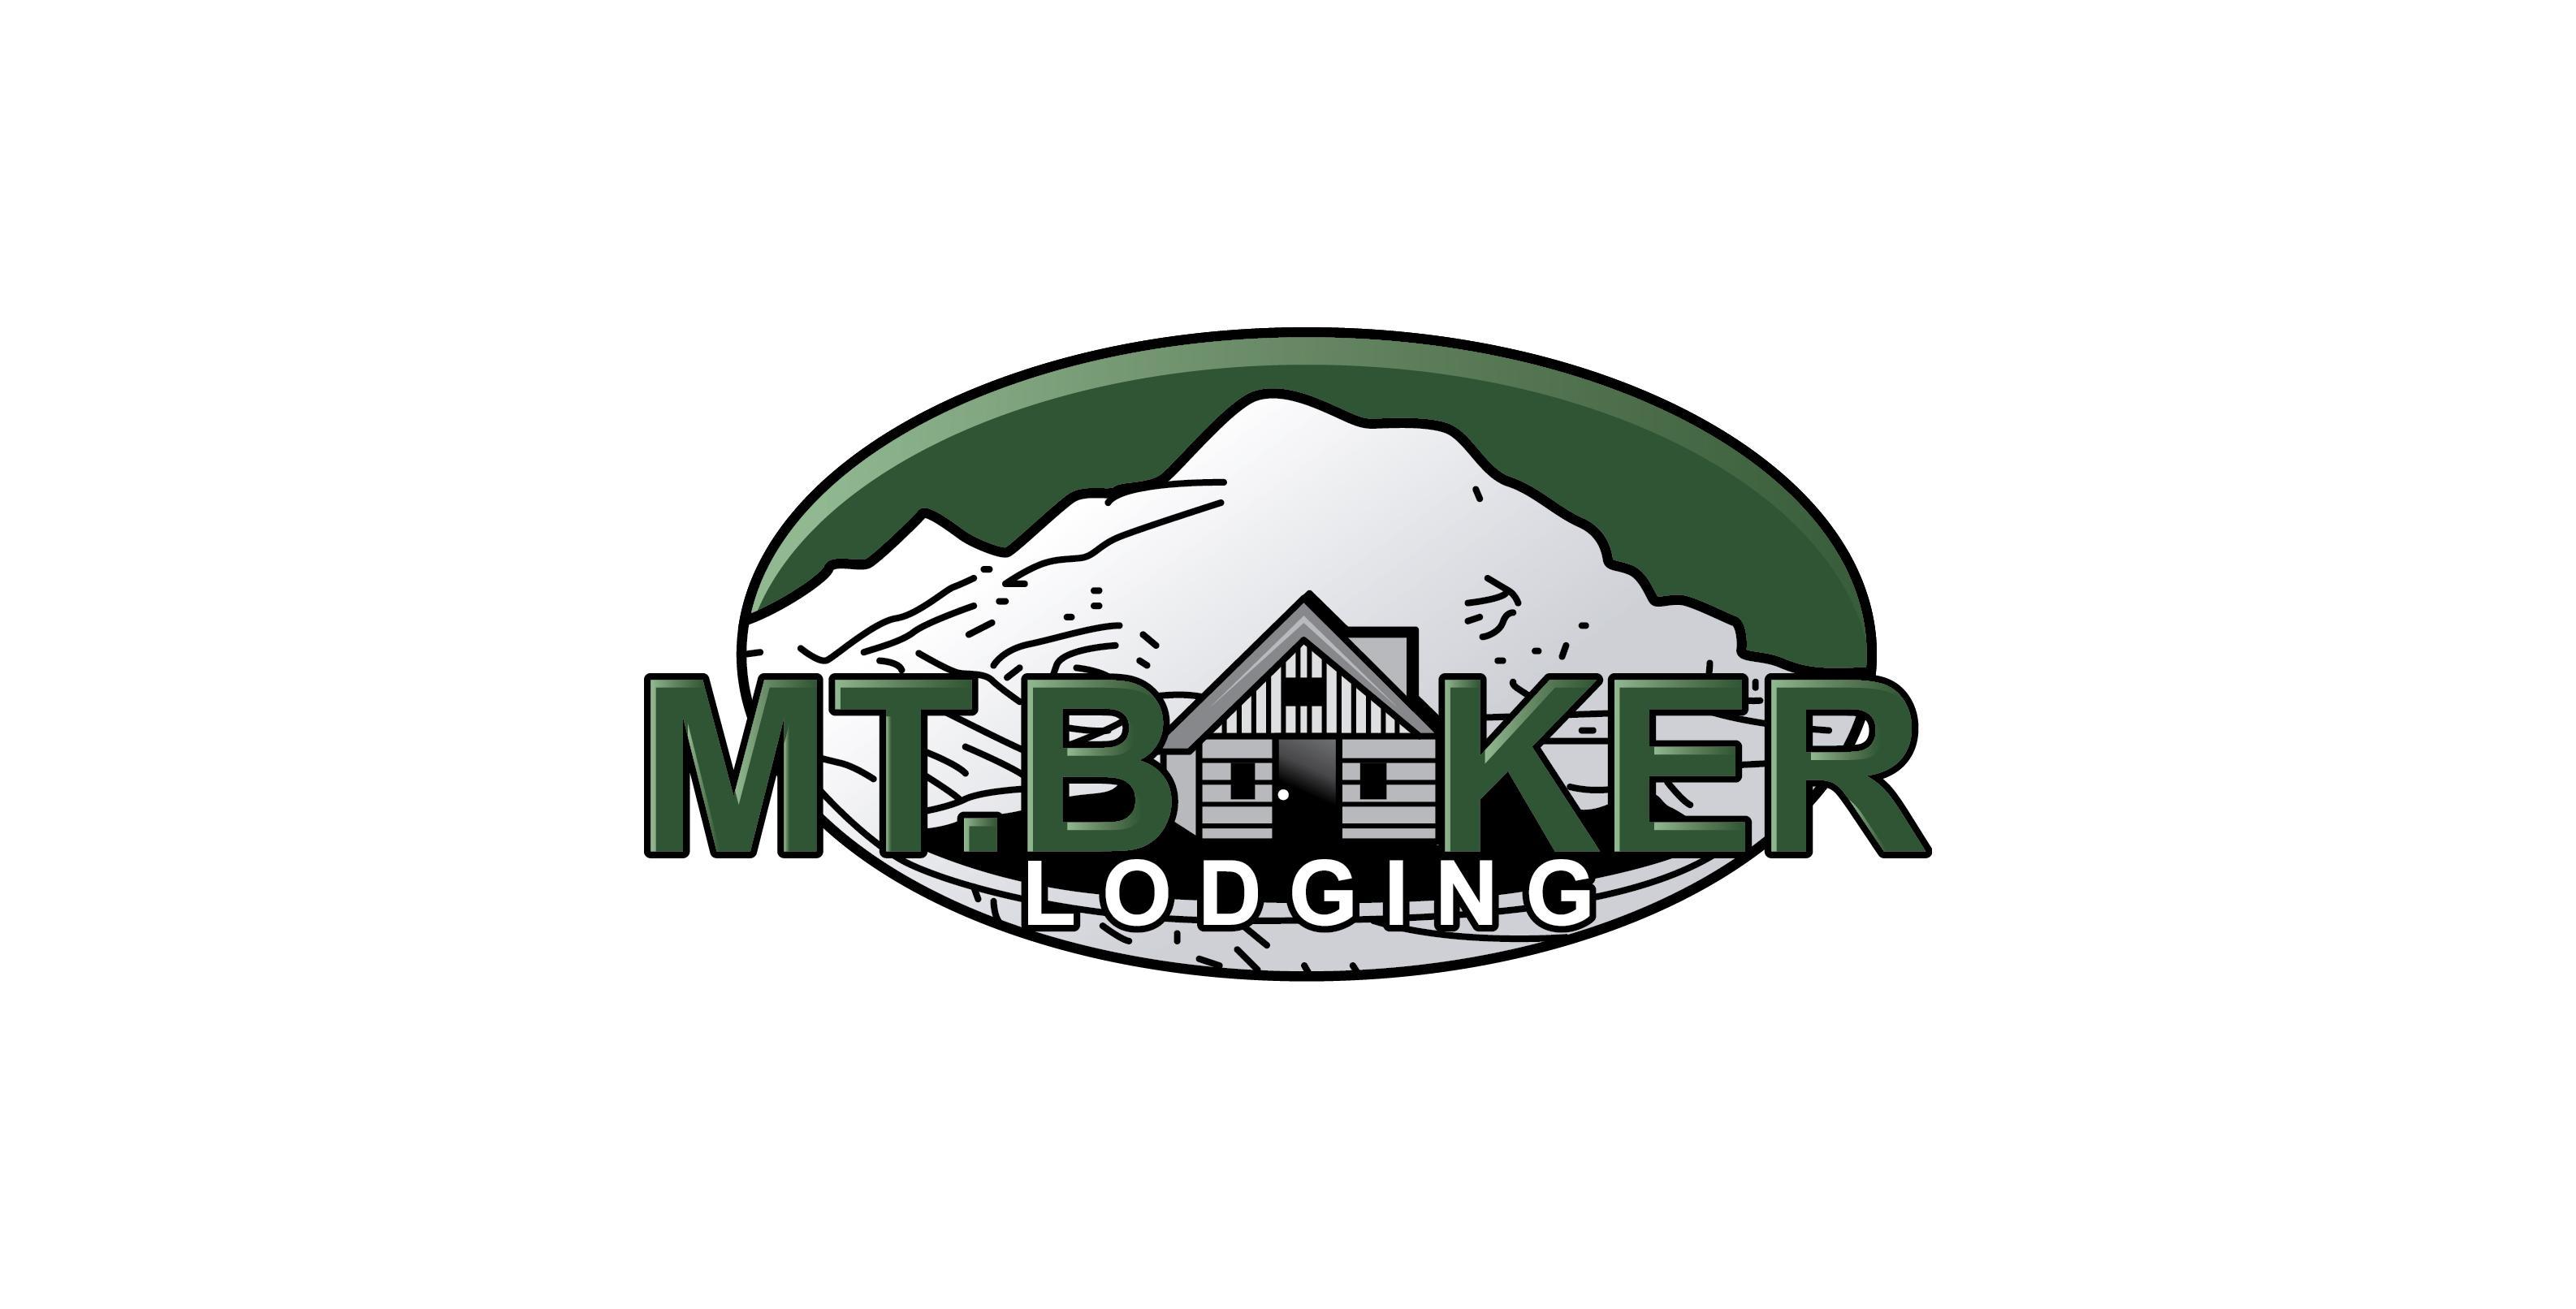 Apartment Mt  Baker Lodging Cabin  33  ndash  FAMILY FUN  WIFI  HOT TUB  SLEEPS 8  photo 31816828